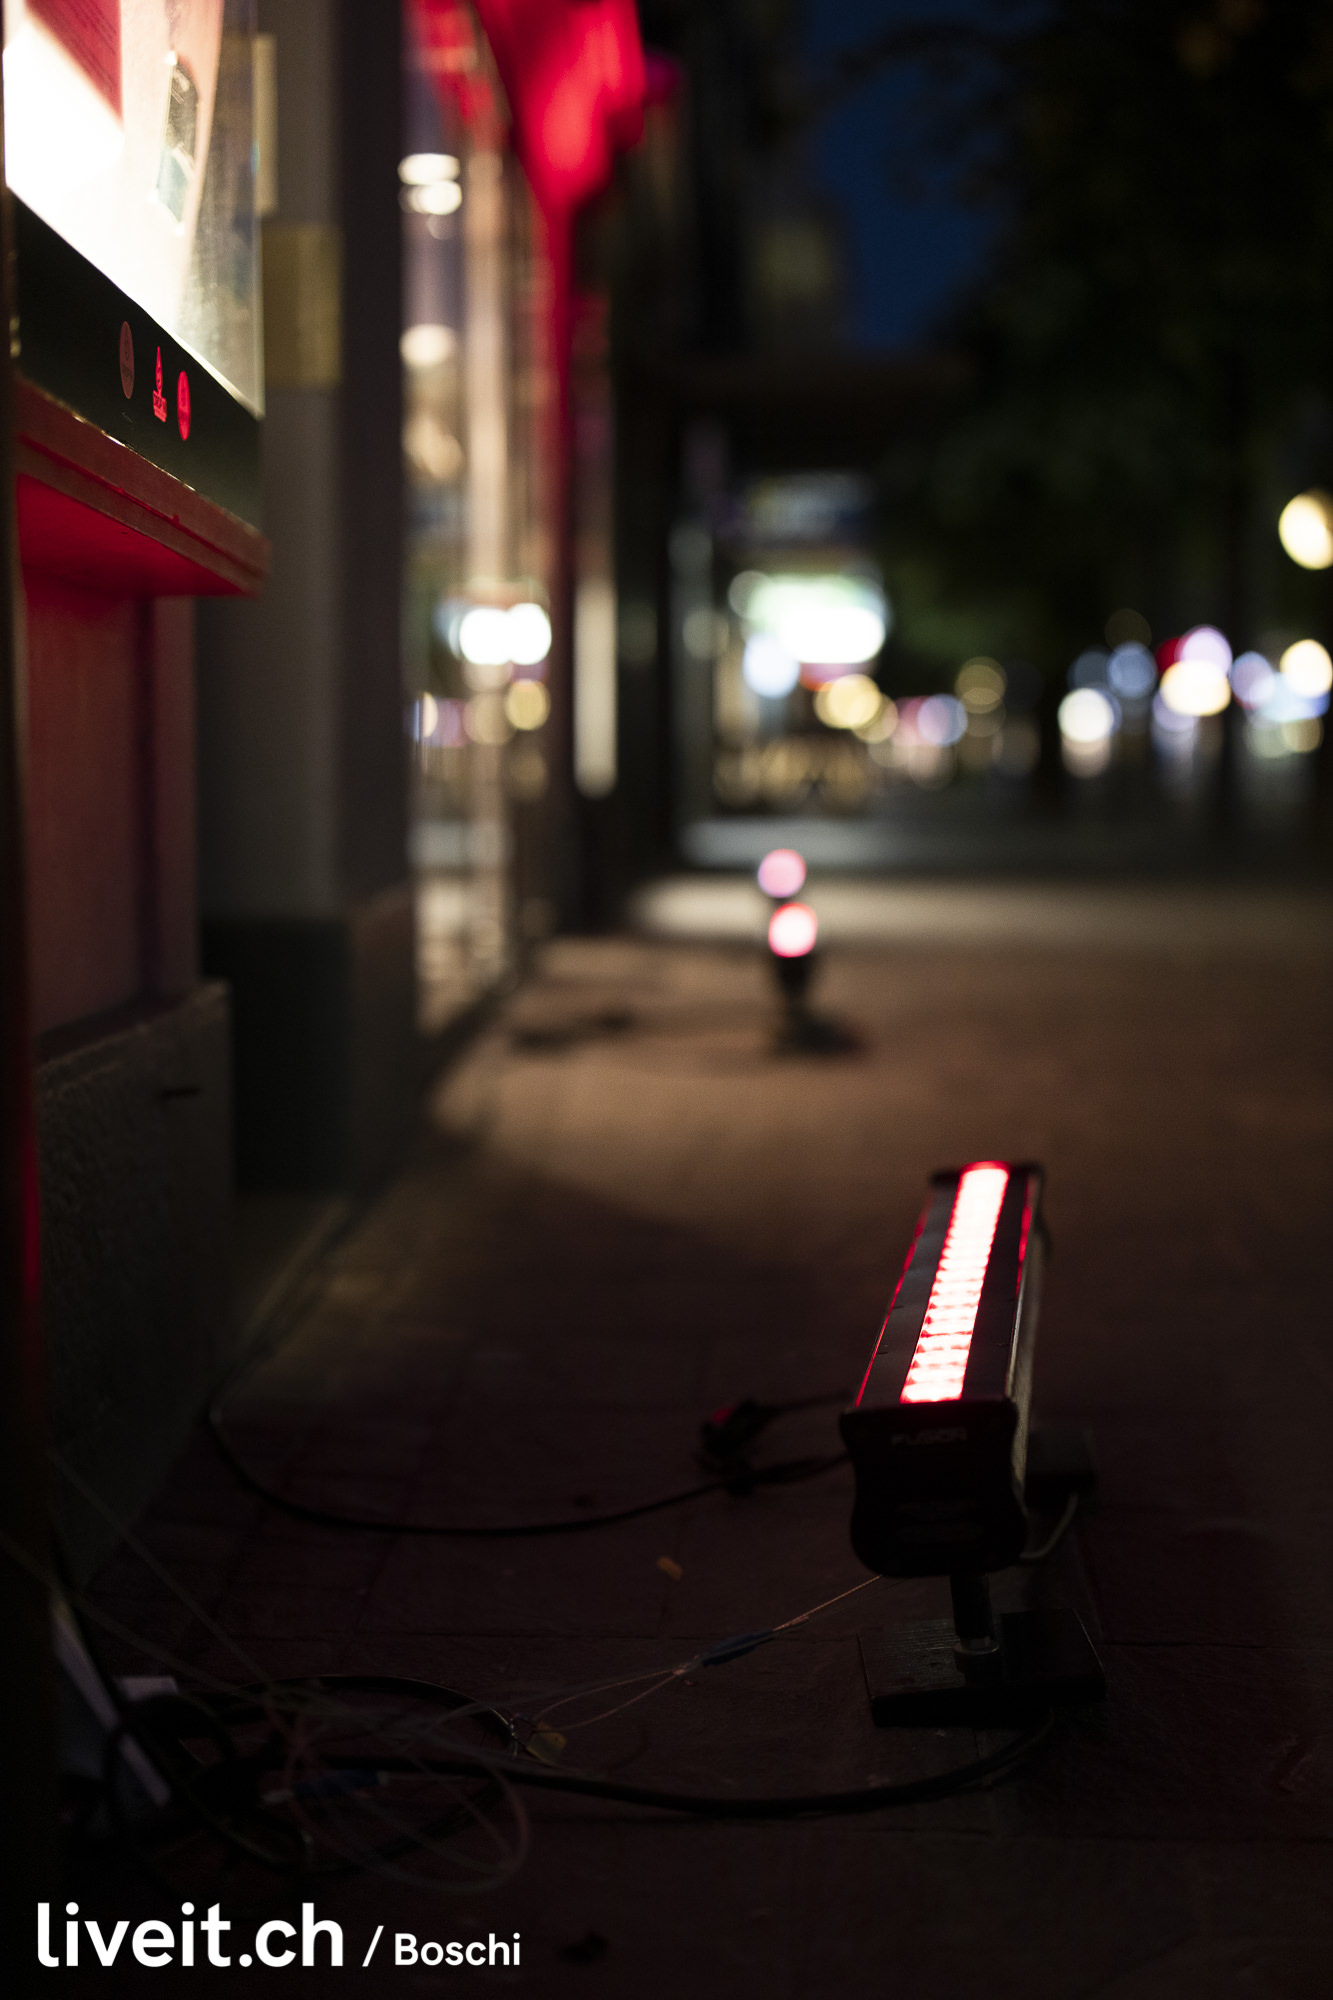 SCHWEIZ NIGHT OF LIGHTS THUN